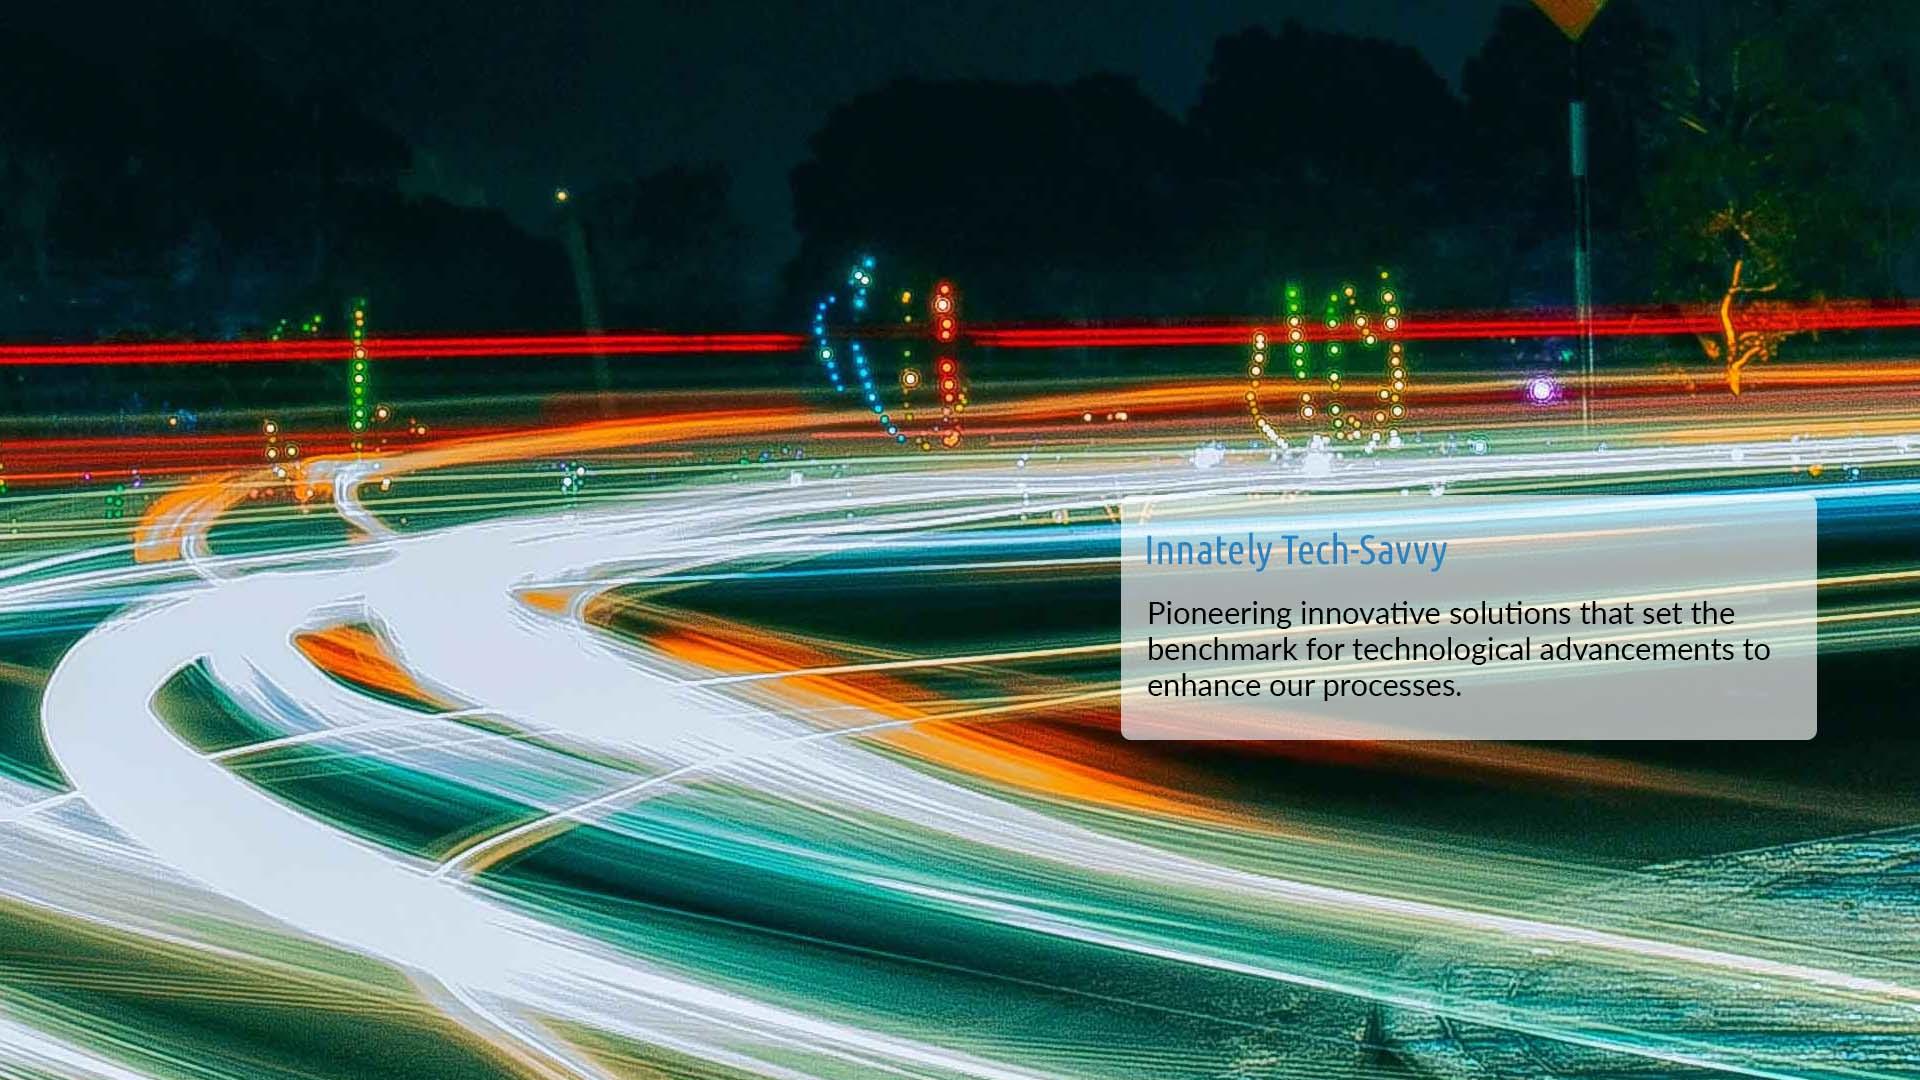 Innately Tech-Savvy